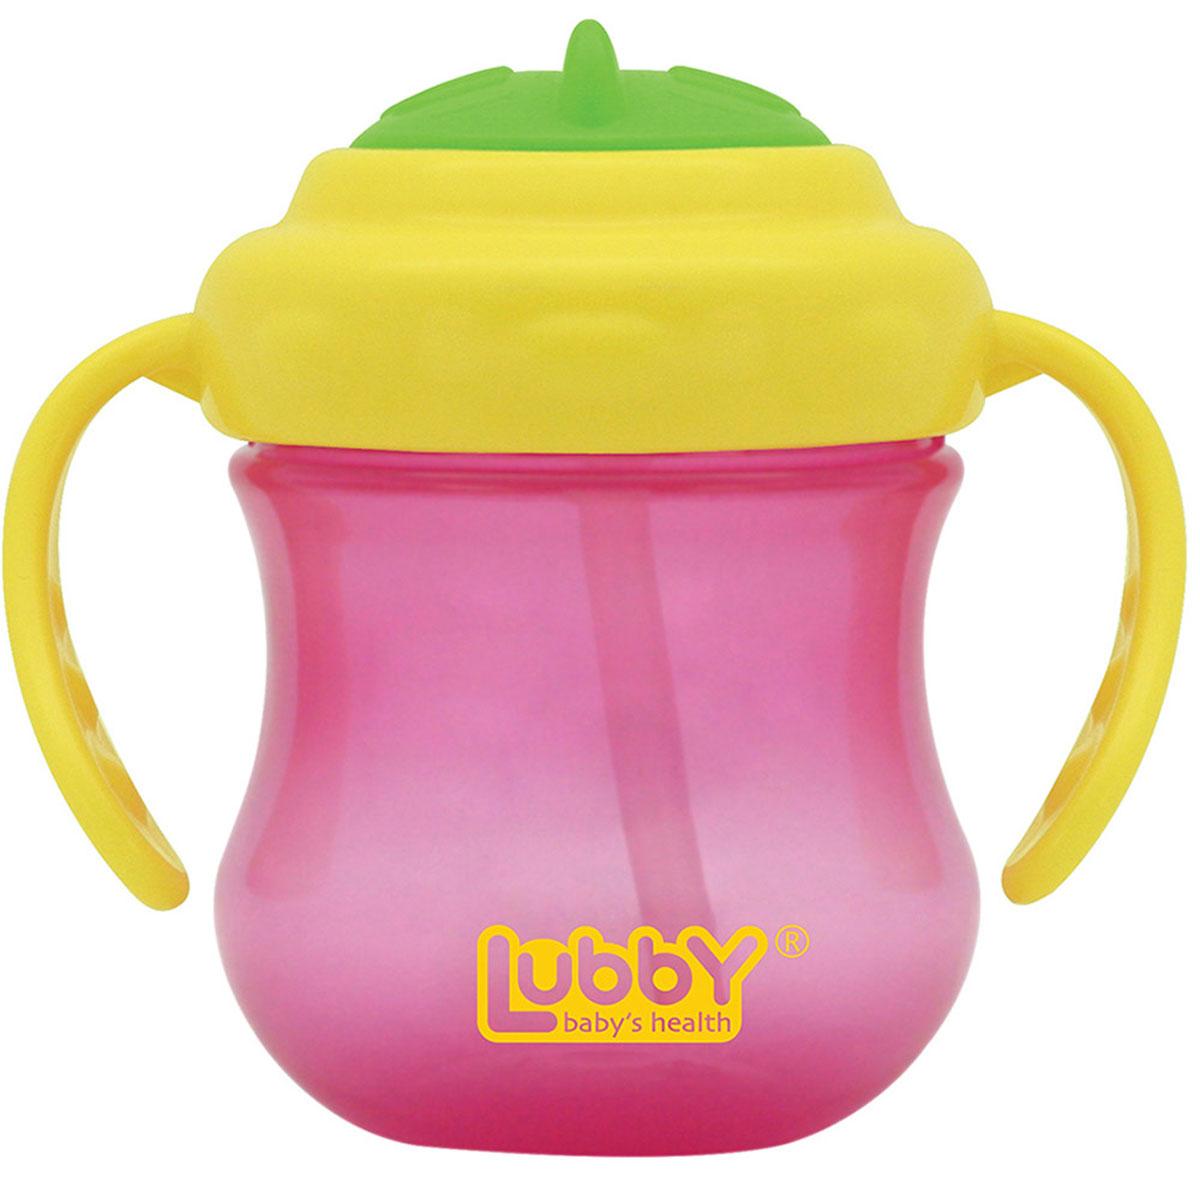 Lubby Поильник-непроливайка Mini Twist с трубочкой от 6 месяцев цвет розовый желтый 250 мл